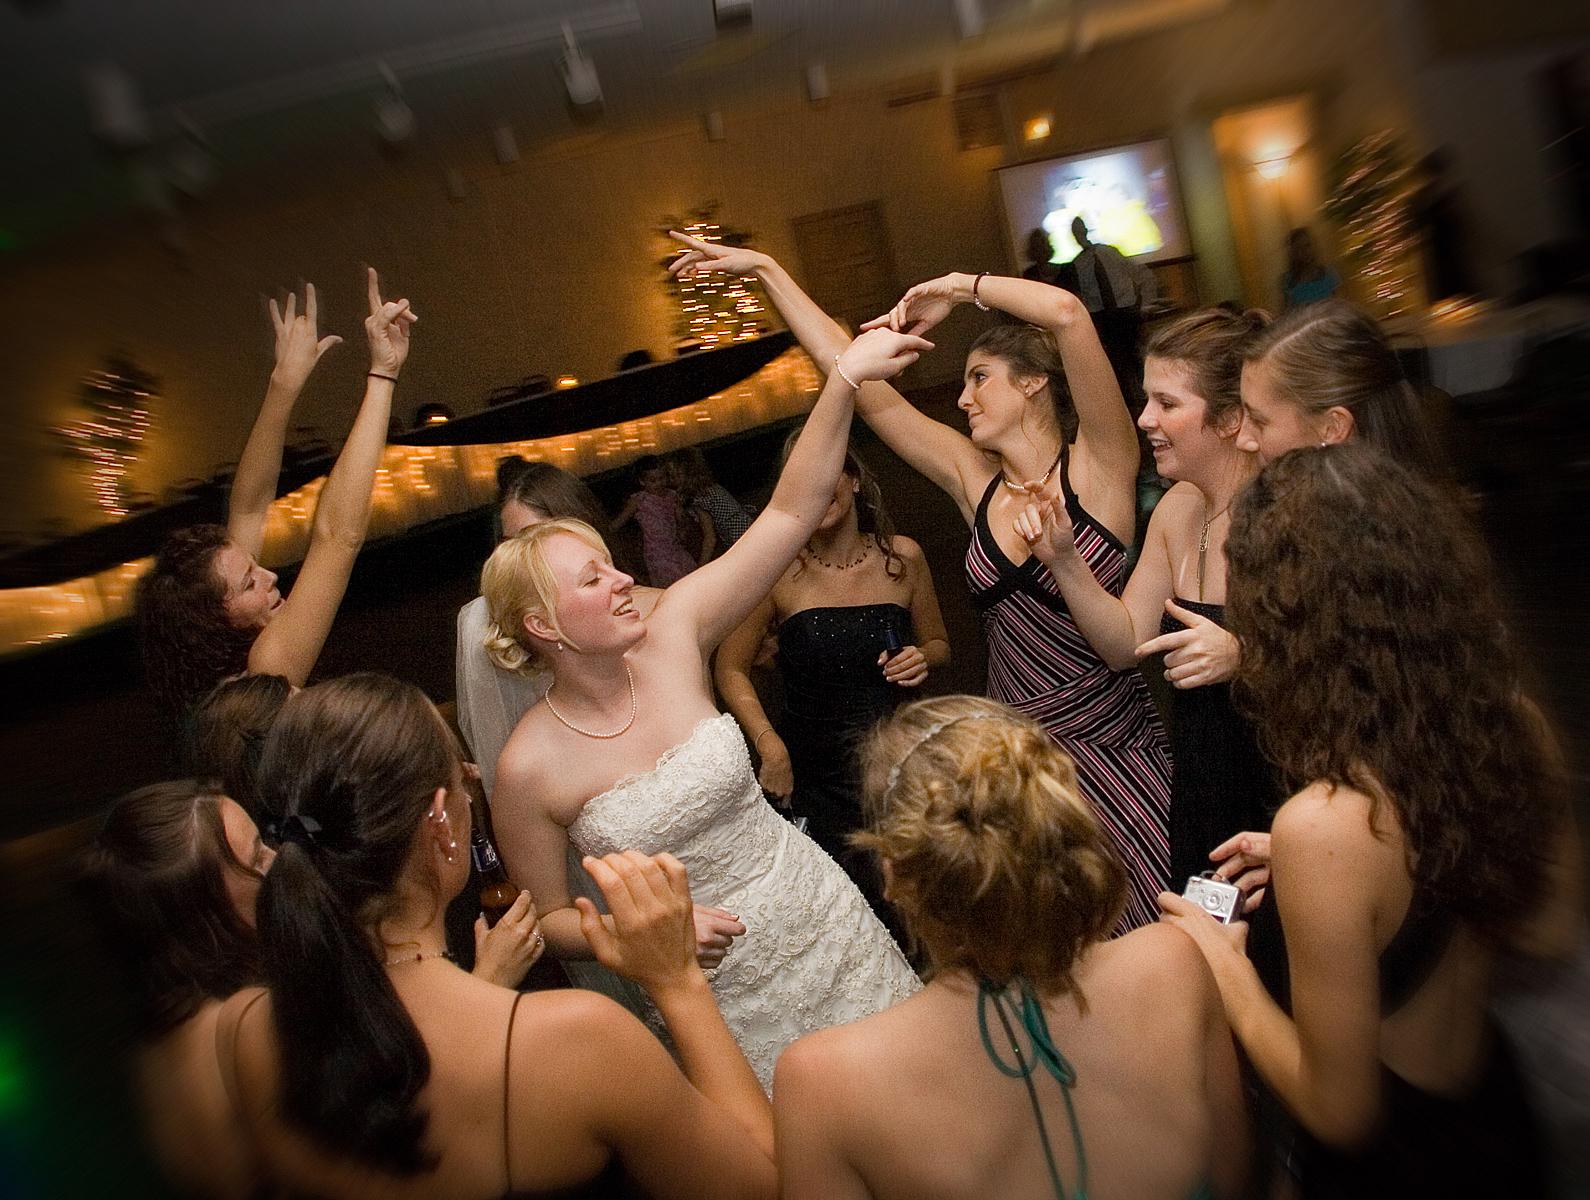 Reception, Flowers & Decor, Bridesmaids, Bridesmaids Dresses, Fashion, Bride, Dance, Dancing, Pheifer photography llc